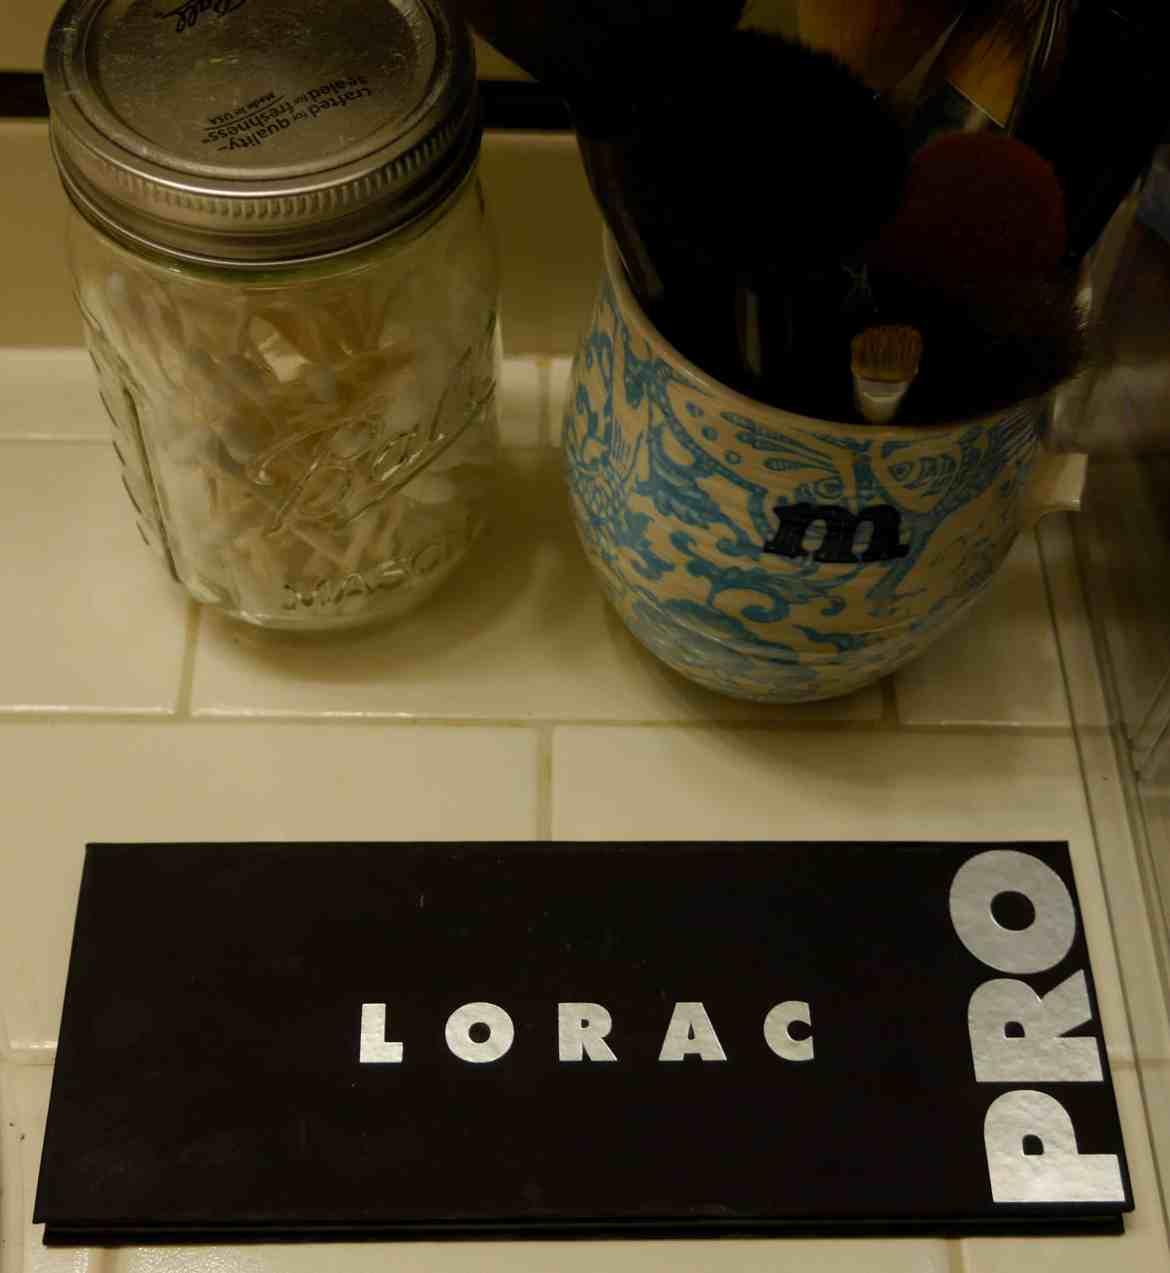 lorac-pro-palette-eyeshadows-swatches.jpeg